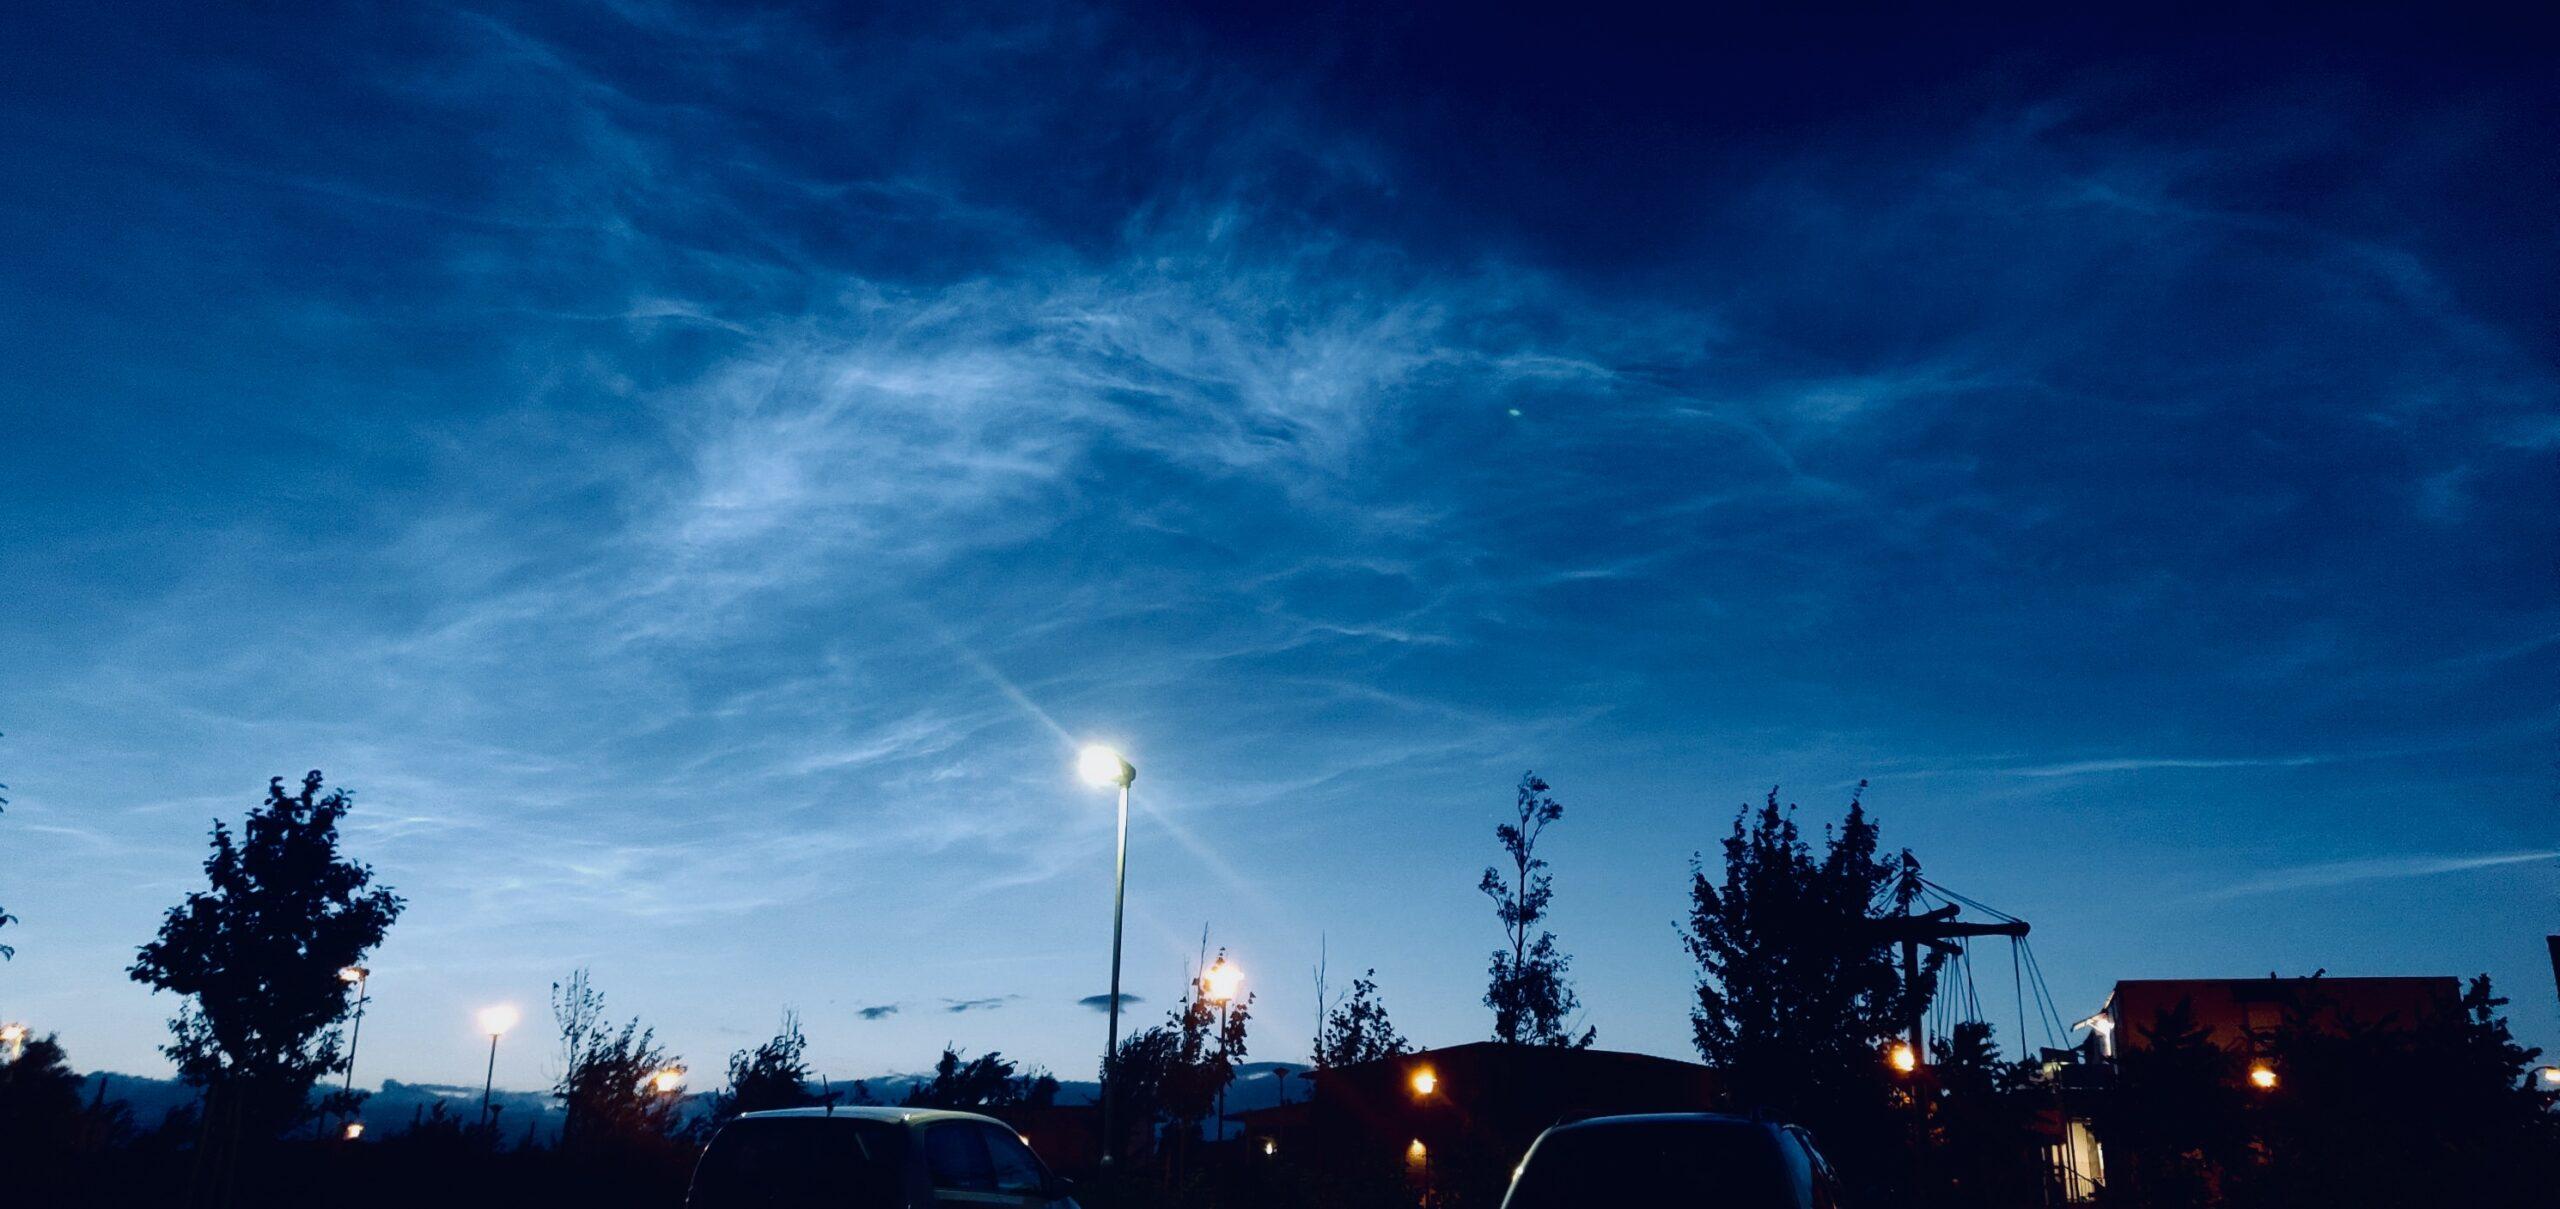 Nattlysande moln. Bild: privat, Rebecca Forsberg